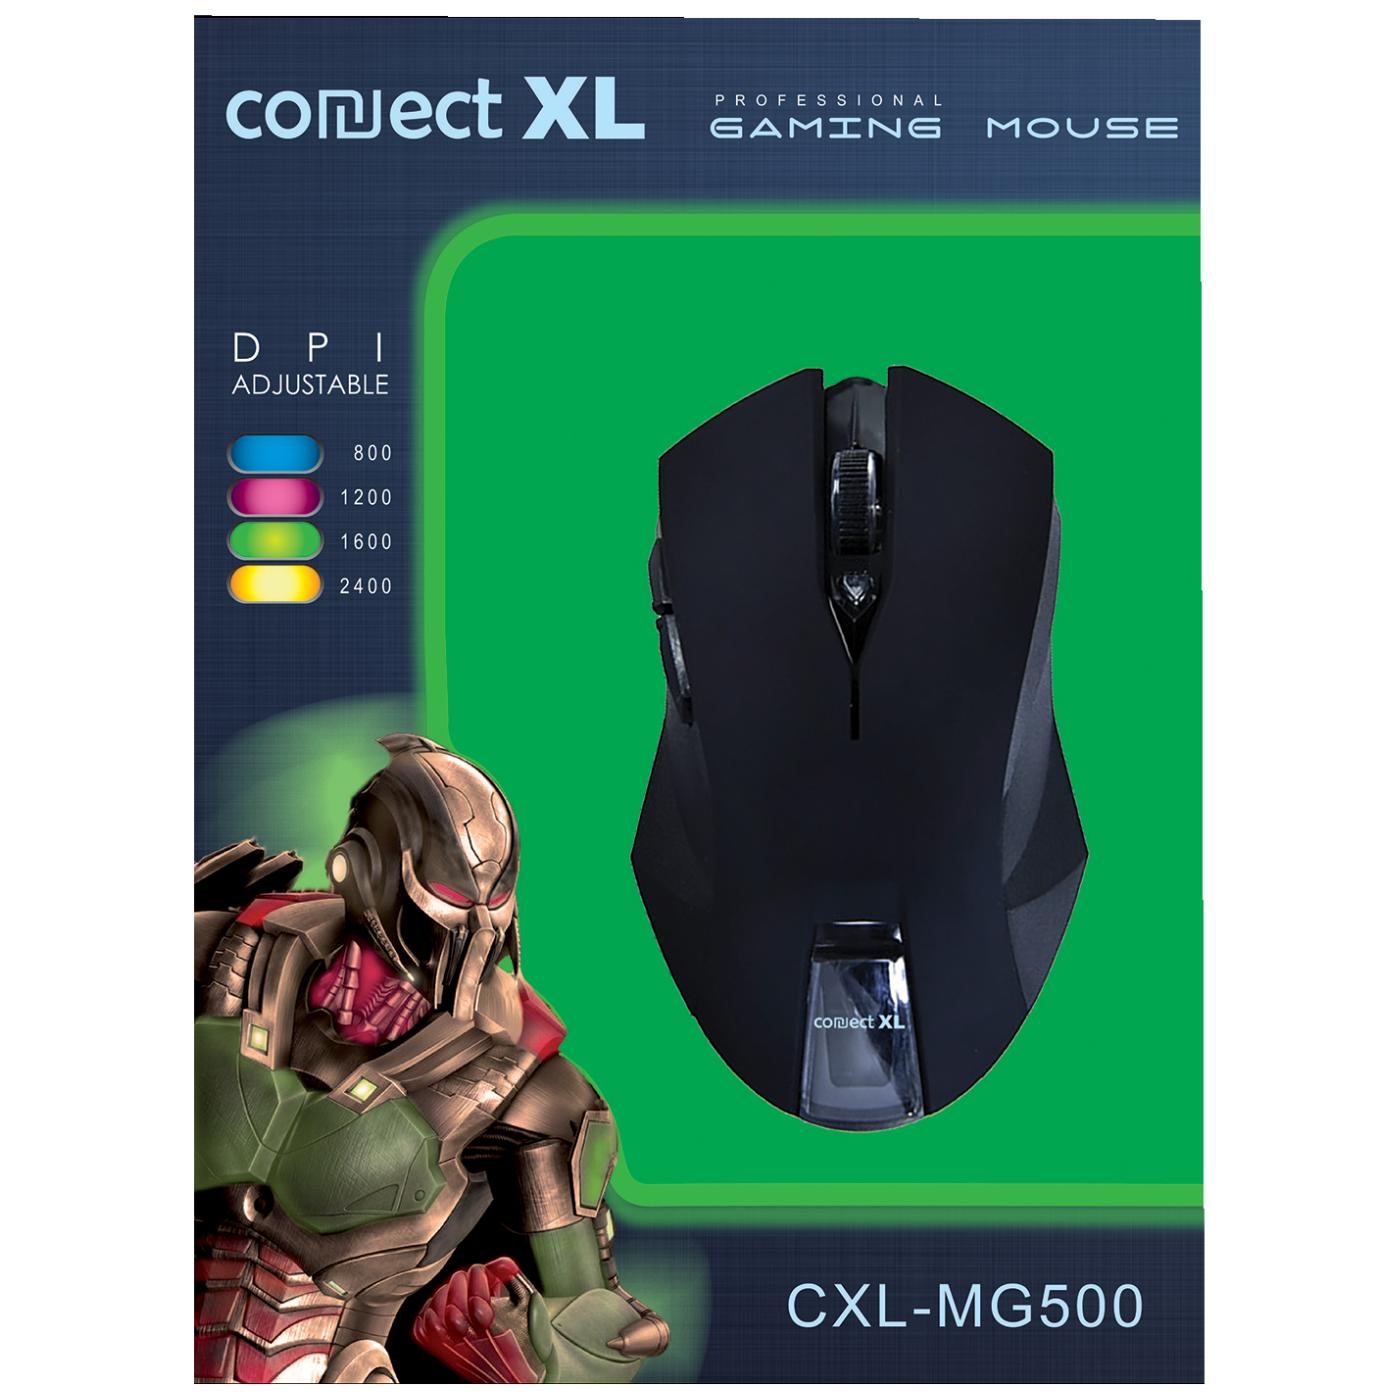 Connect XL - CXL-MG500